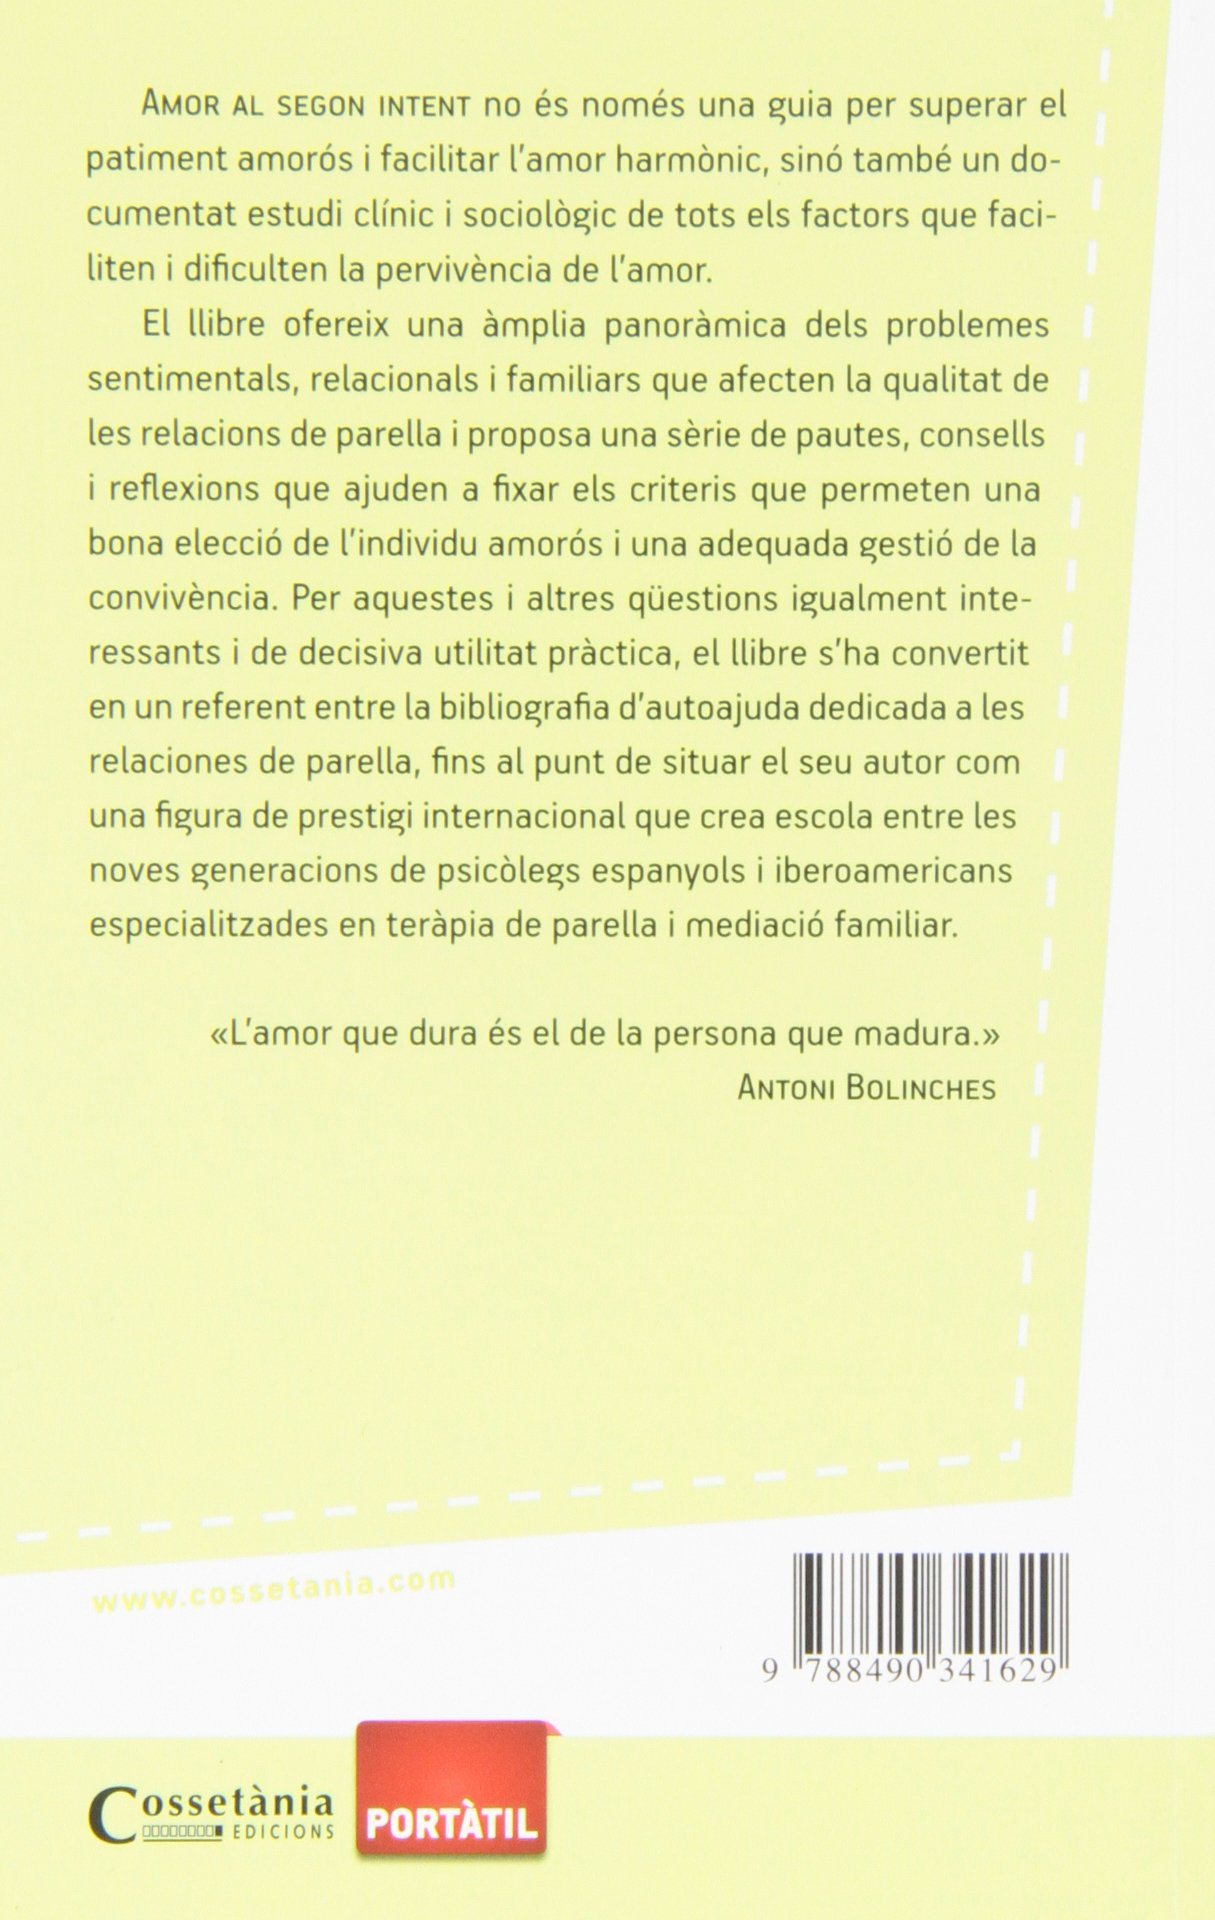 Amor Al Segon Intent (Biblioteca Antoni Bolinches): Amazon.es: Antoni Bolinches: Libros